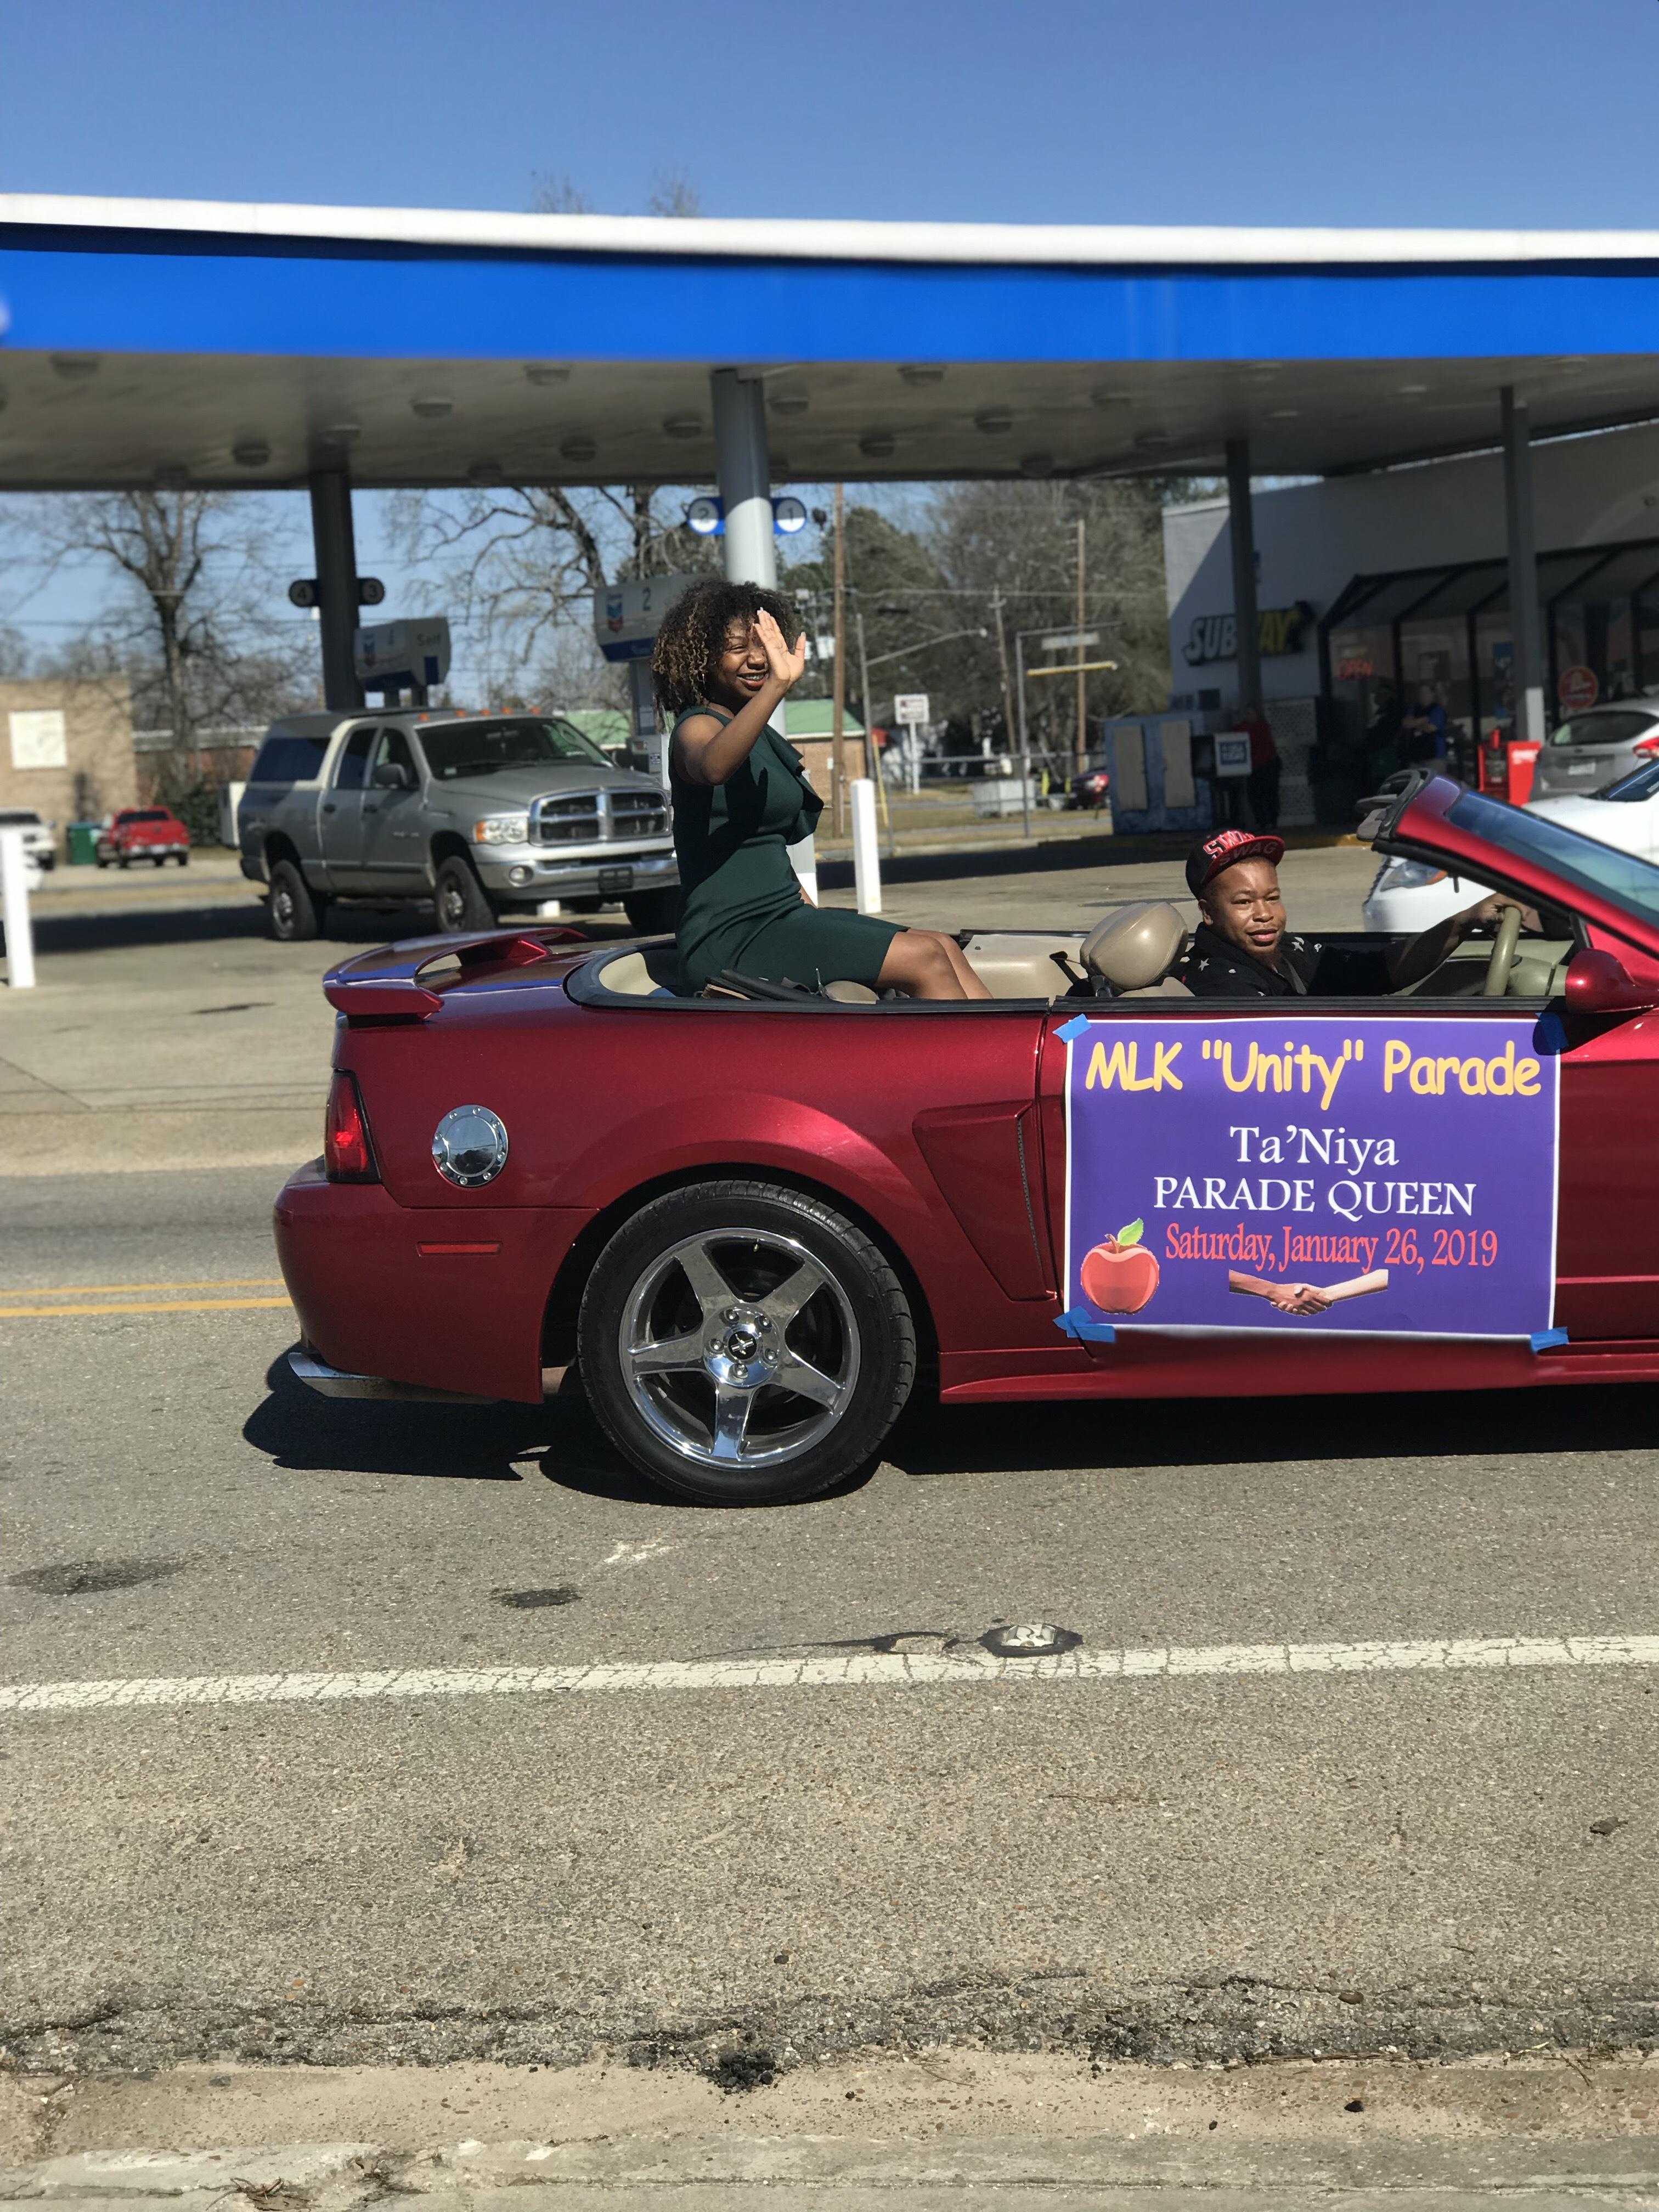 The MLK Parade Queen rides in a convertible.